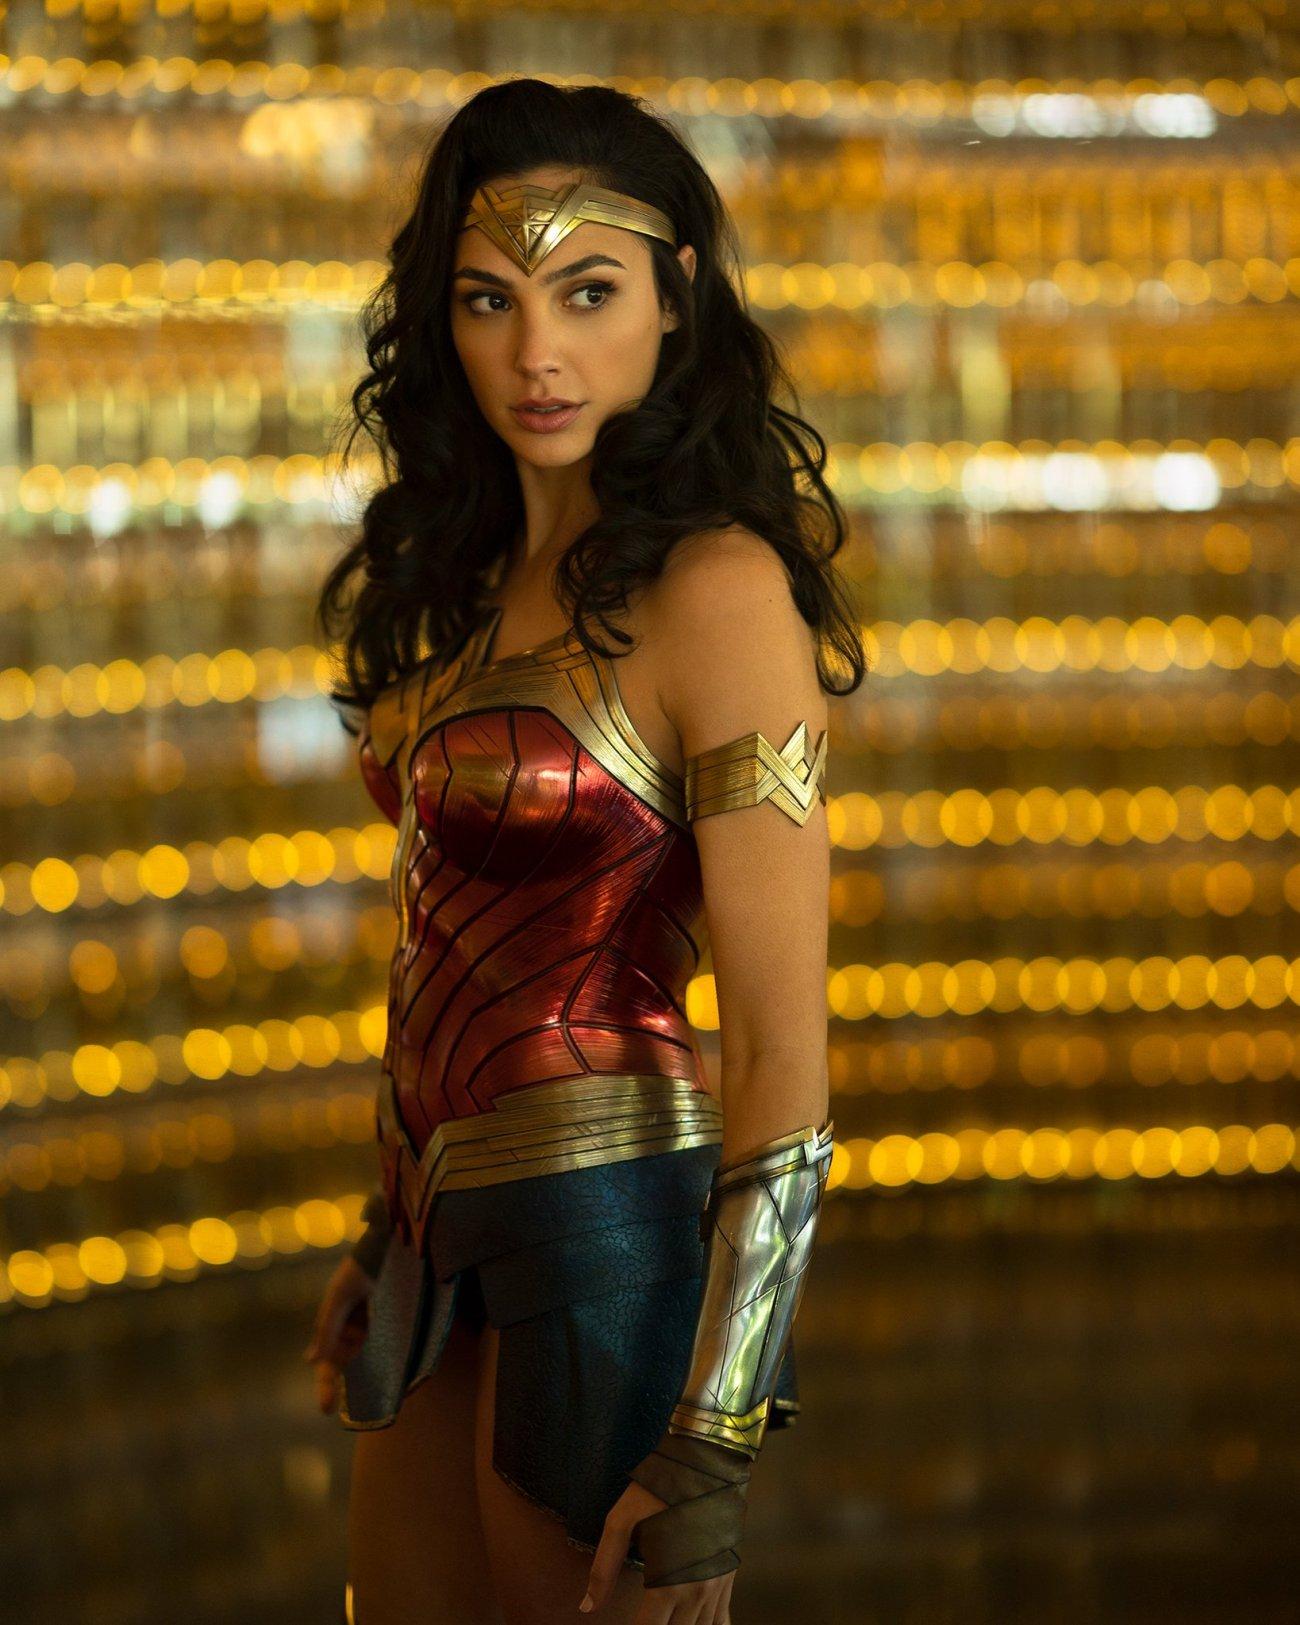 Wonder Woman (Gal Gadot) en Wonder Woman 1984 (2020). Imagen: Gal Gadot Twitter (@GalGadot).